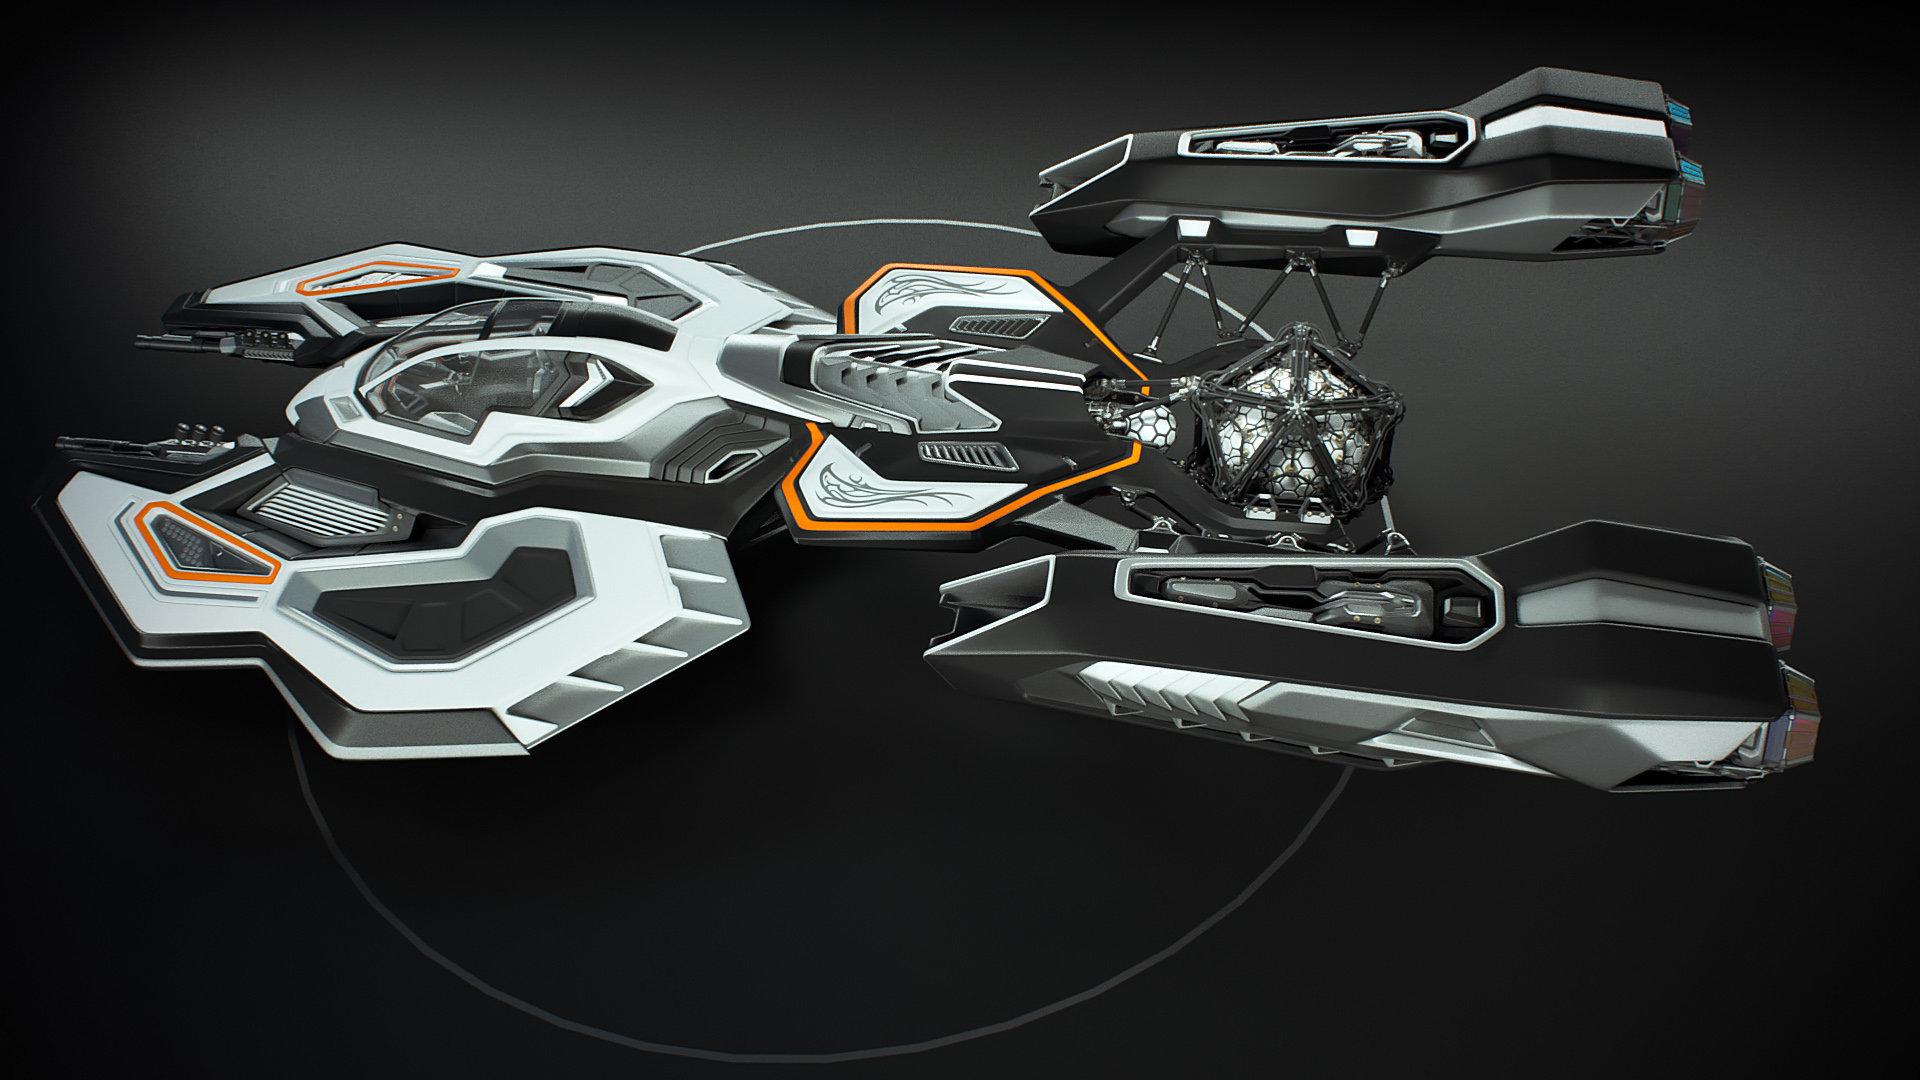 Johan de leenheer 3d spaceship faucer fuga mx230e 03